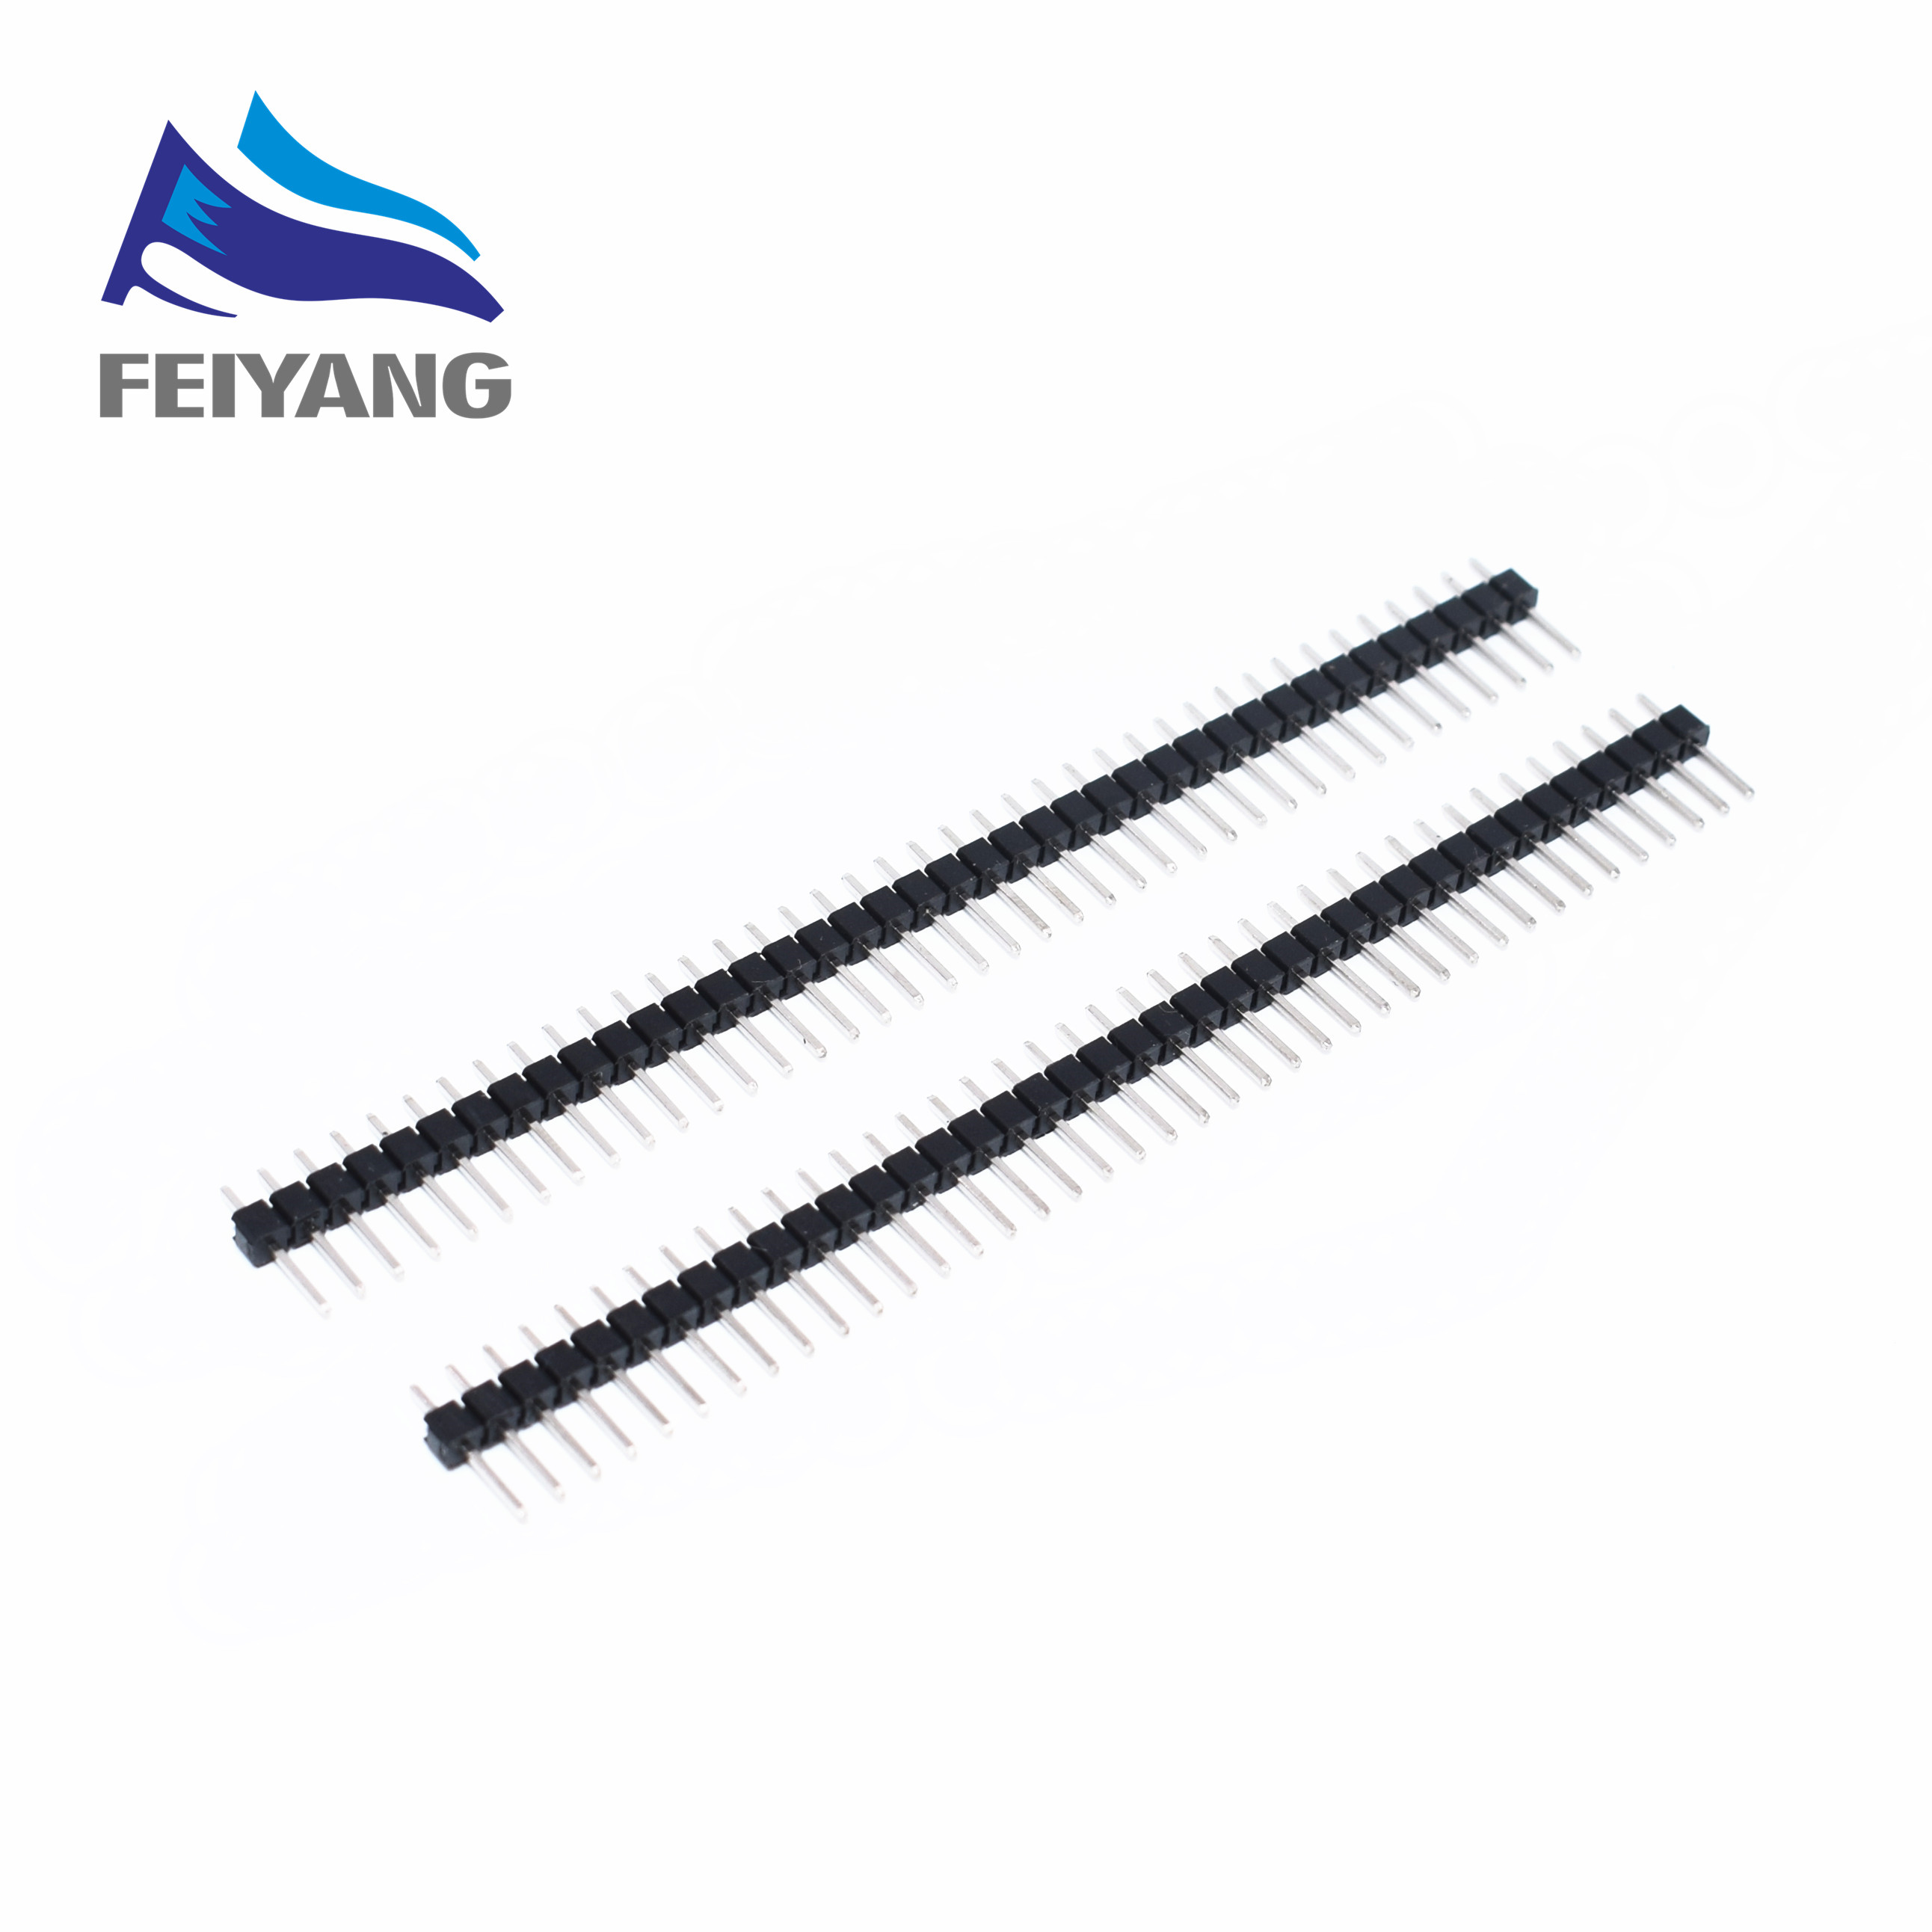 u033f u033f u033f  u2022 u032a  10pcs 40 pin 1x40 single  u2460 row row male 2 54 breakable  u3010 u3011 pin pin header connector strip